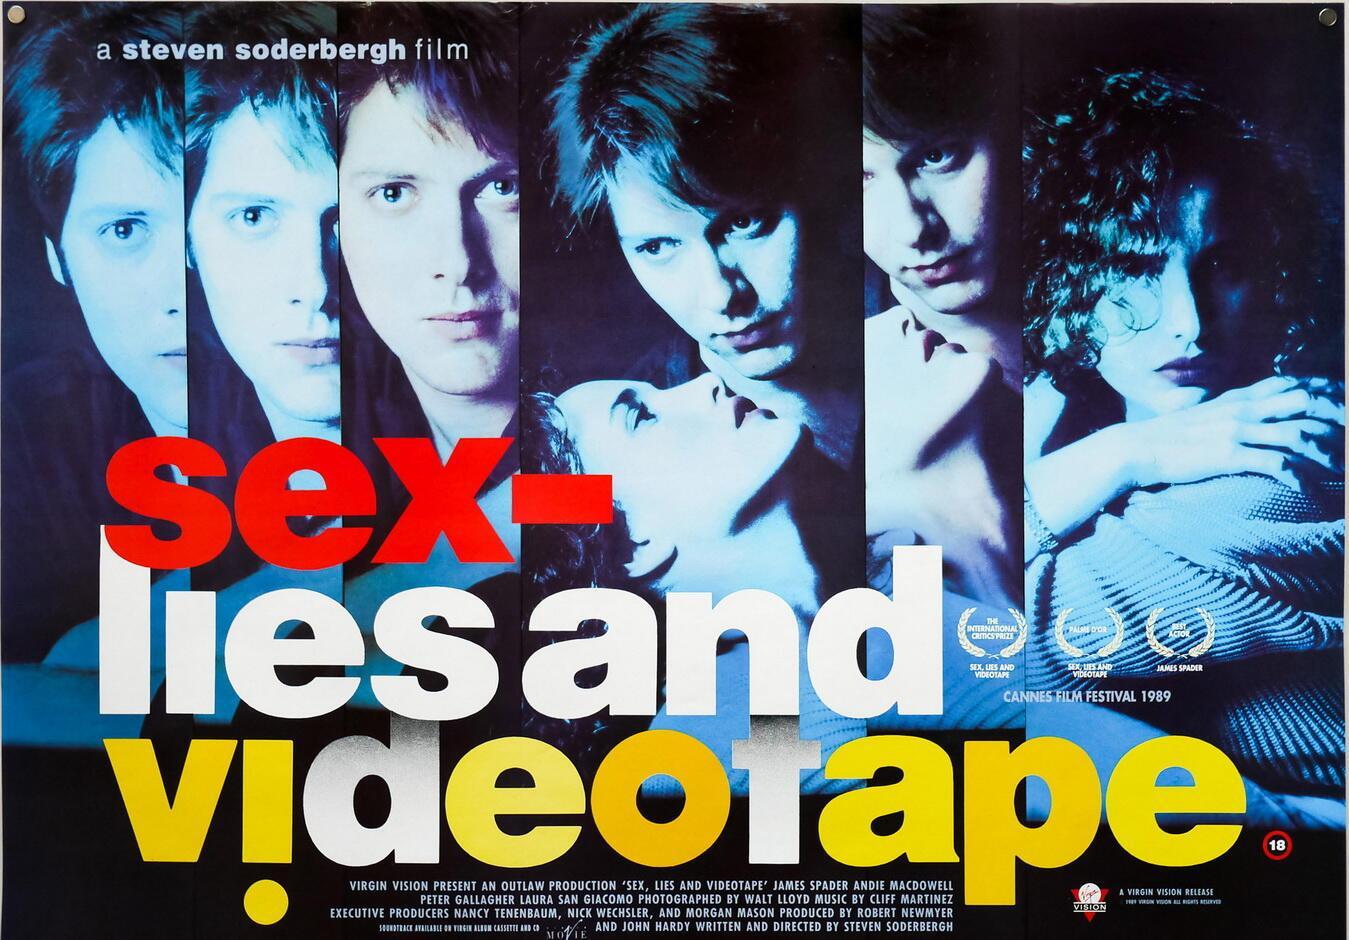 """Секс, ложь и видео"". Фильм Стивена Содерберга (1989)."